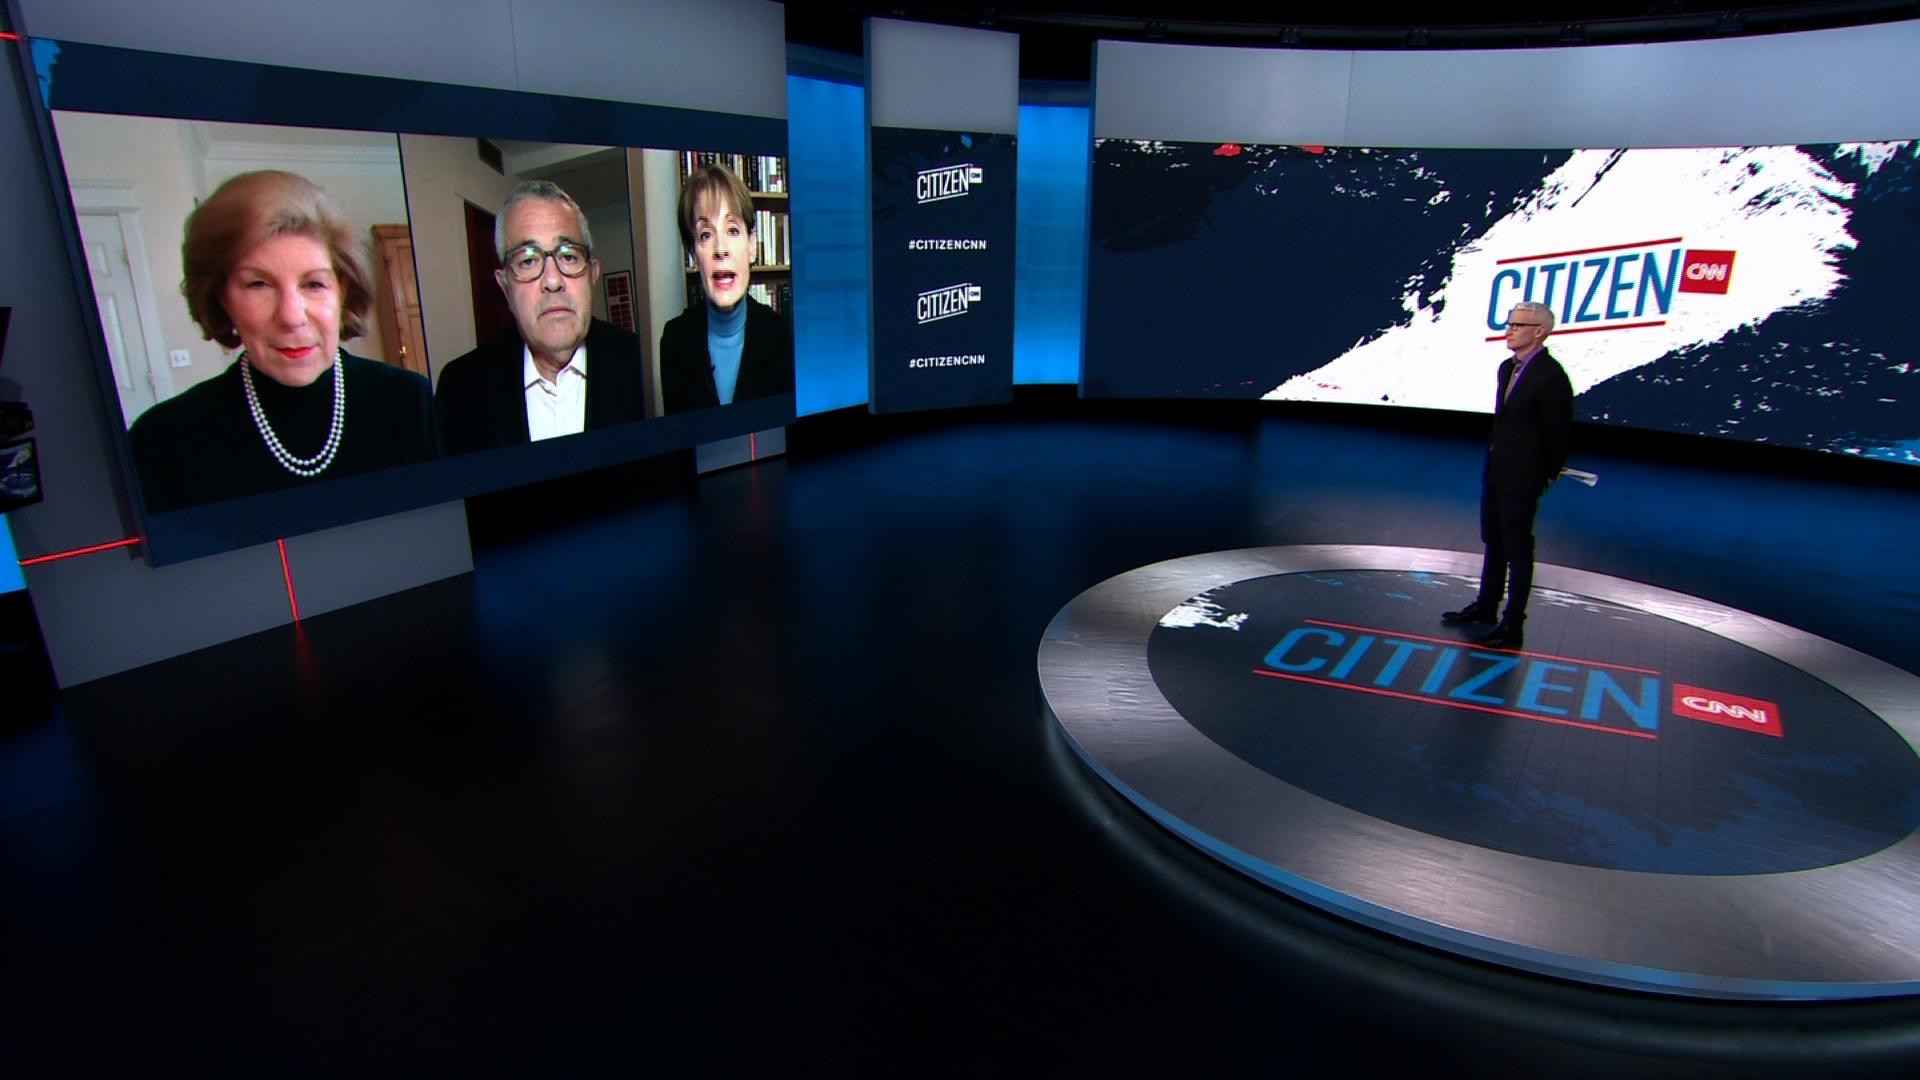 Nina Totenberg, Jeffrey Toobin and Joan Biskupic speak with Anderson Cooper.